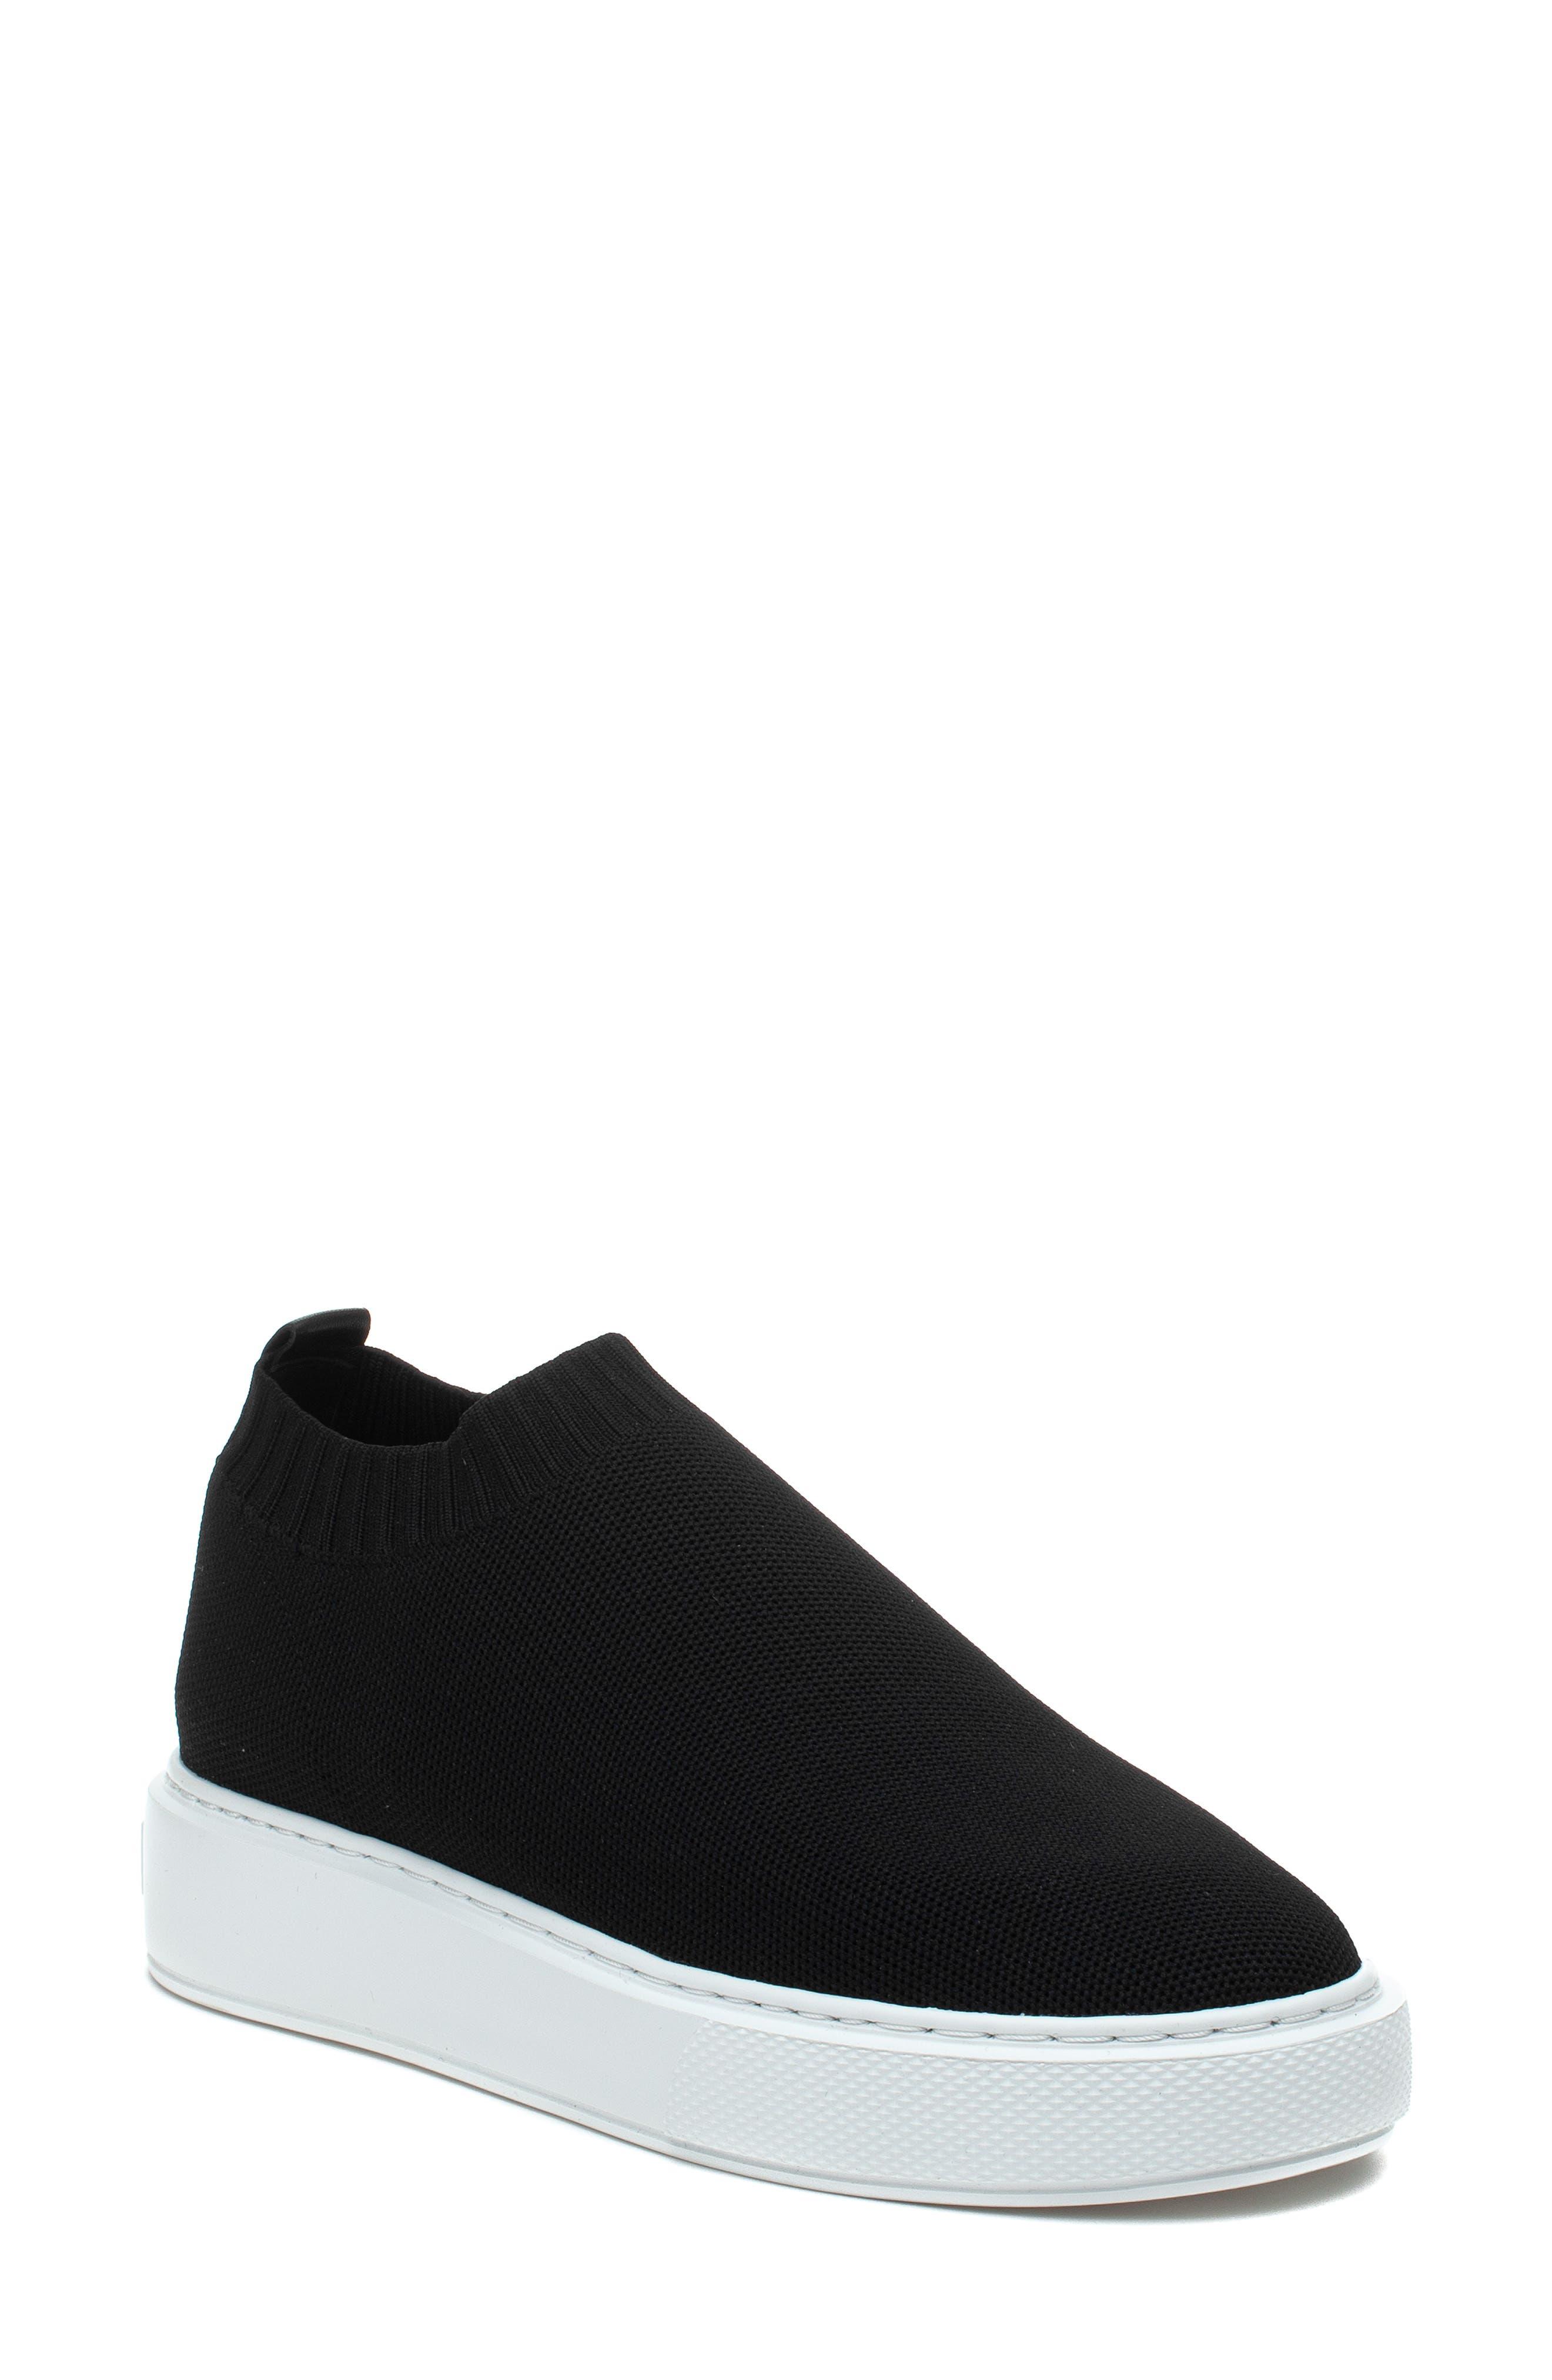 Image of J/Slides Daphnie Knit Slip-On Sneaker